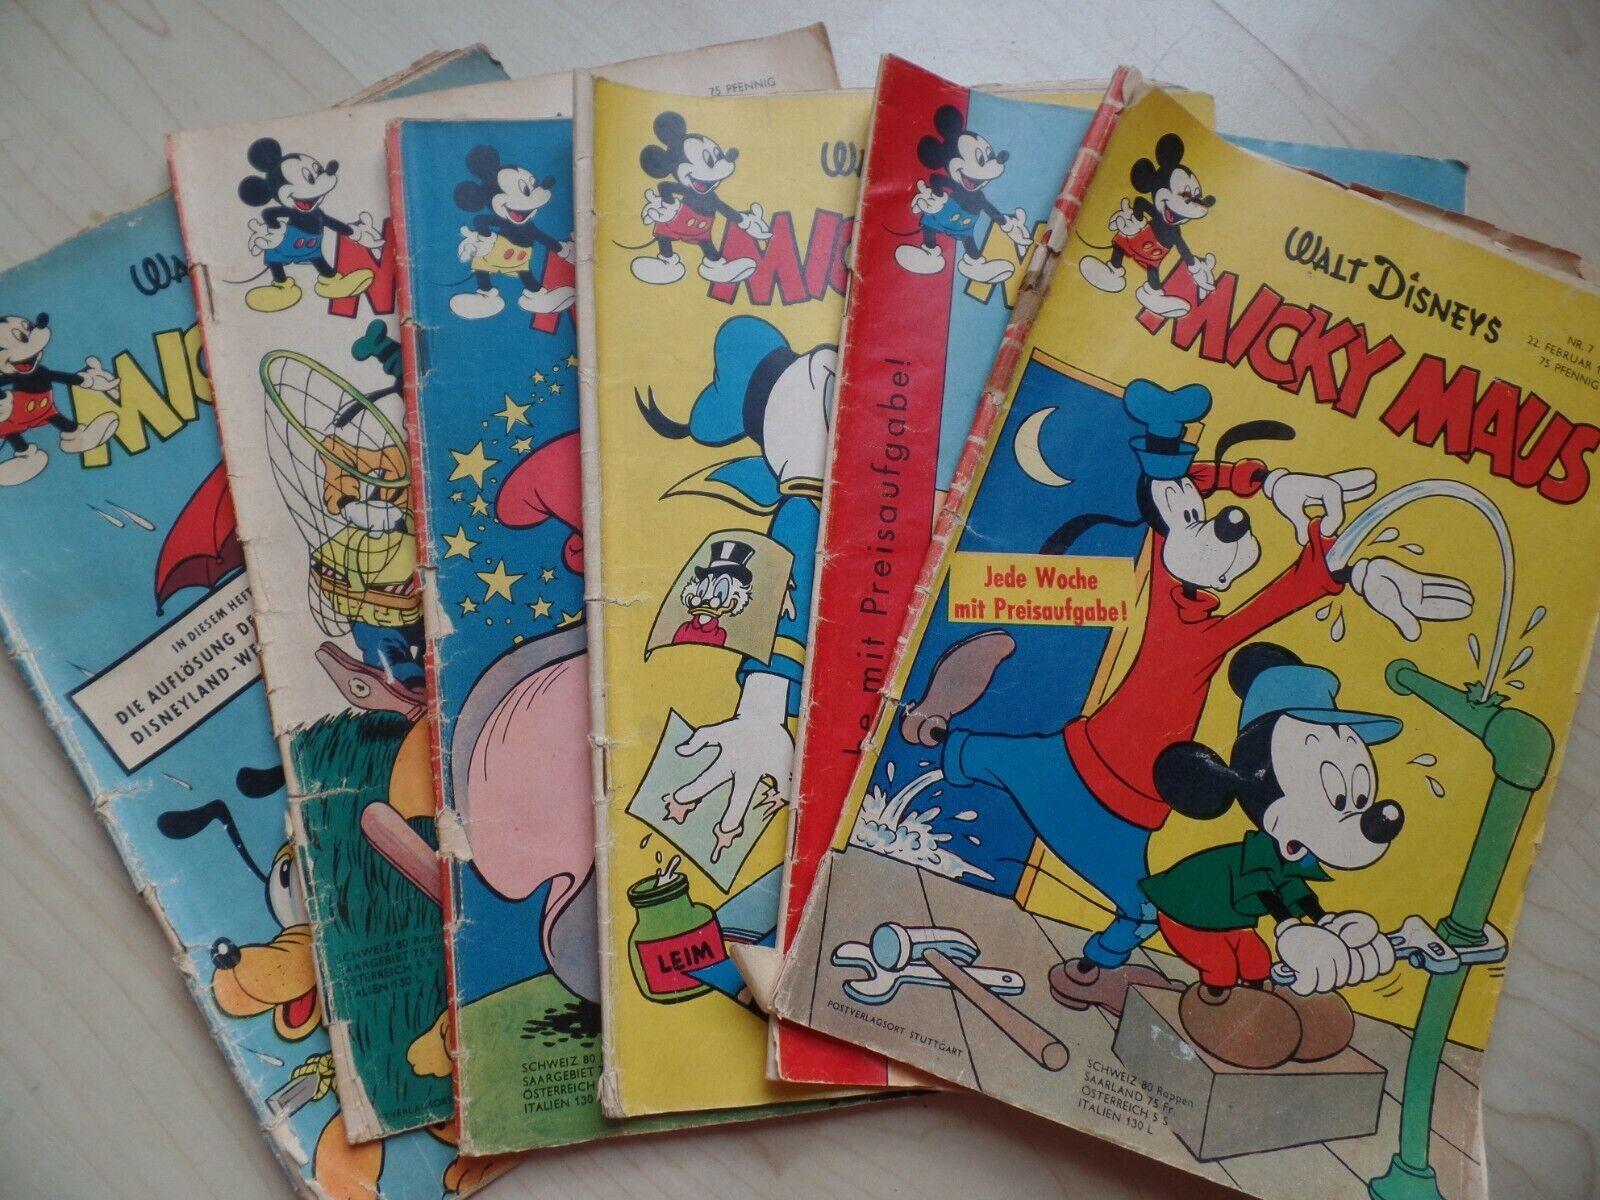 Micky Maus 1956 Heft 12, 16, 17 + 1958 Heft 7, 34, 47